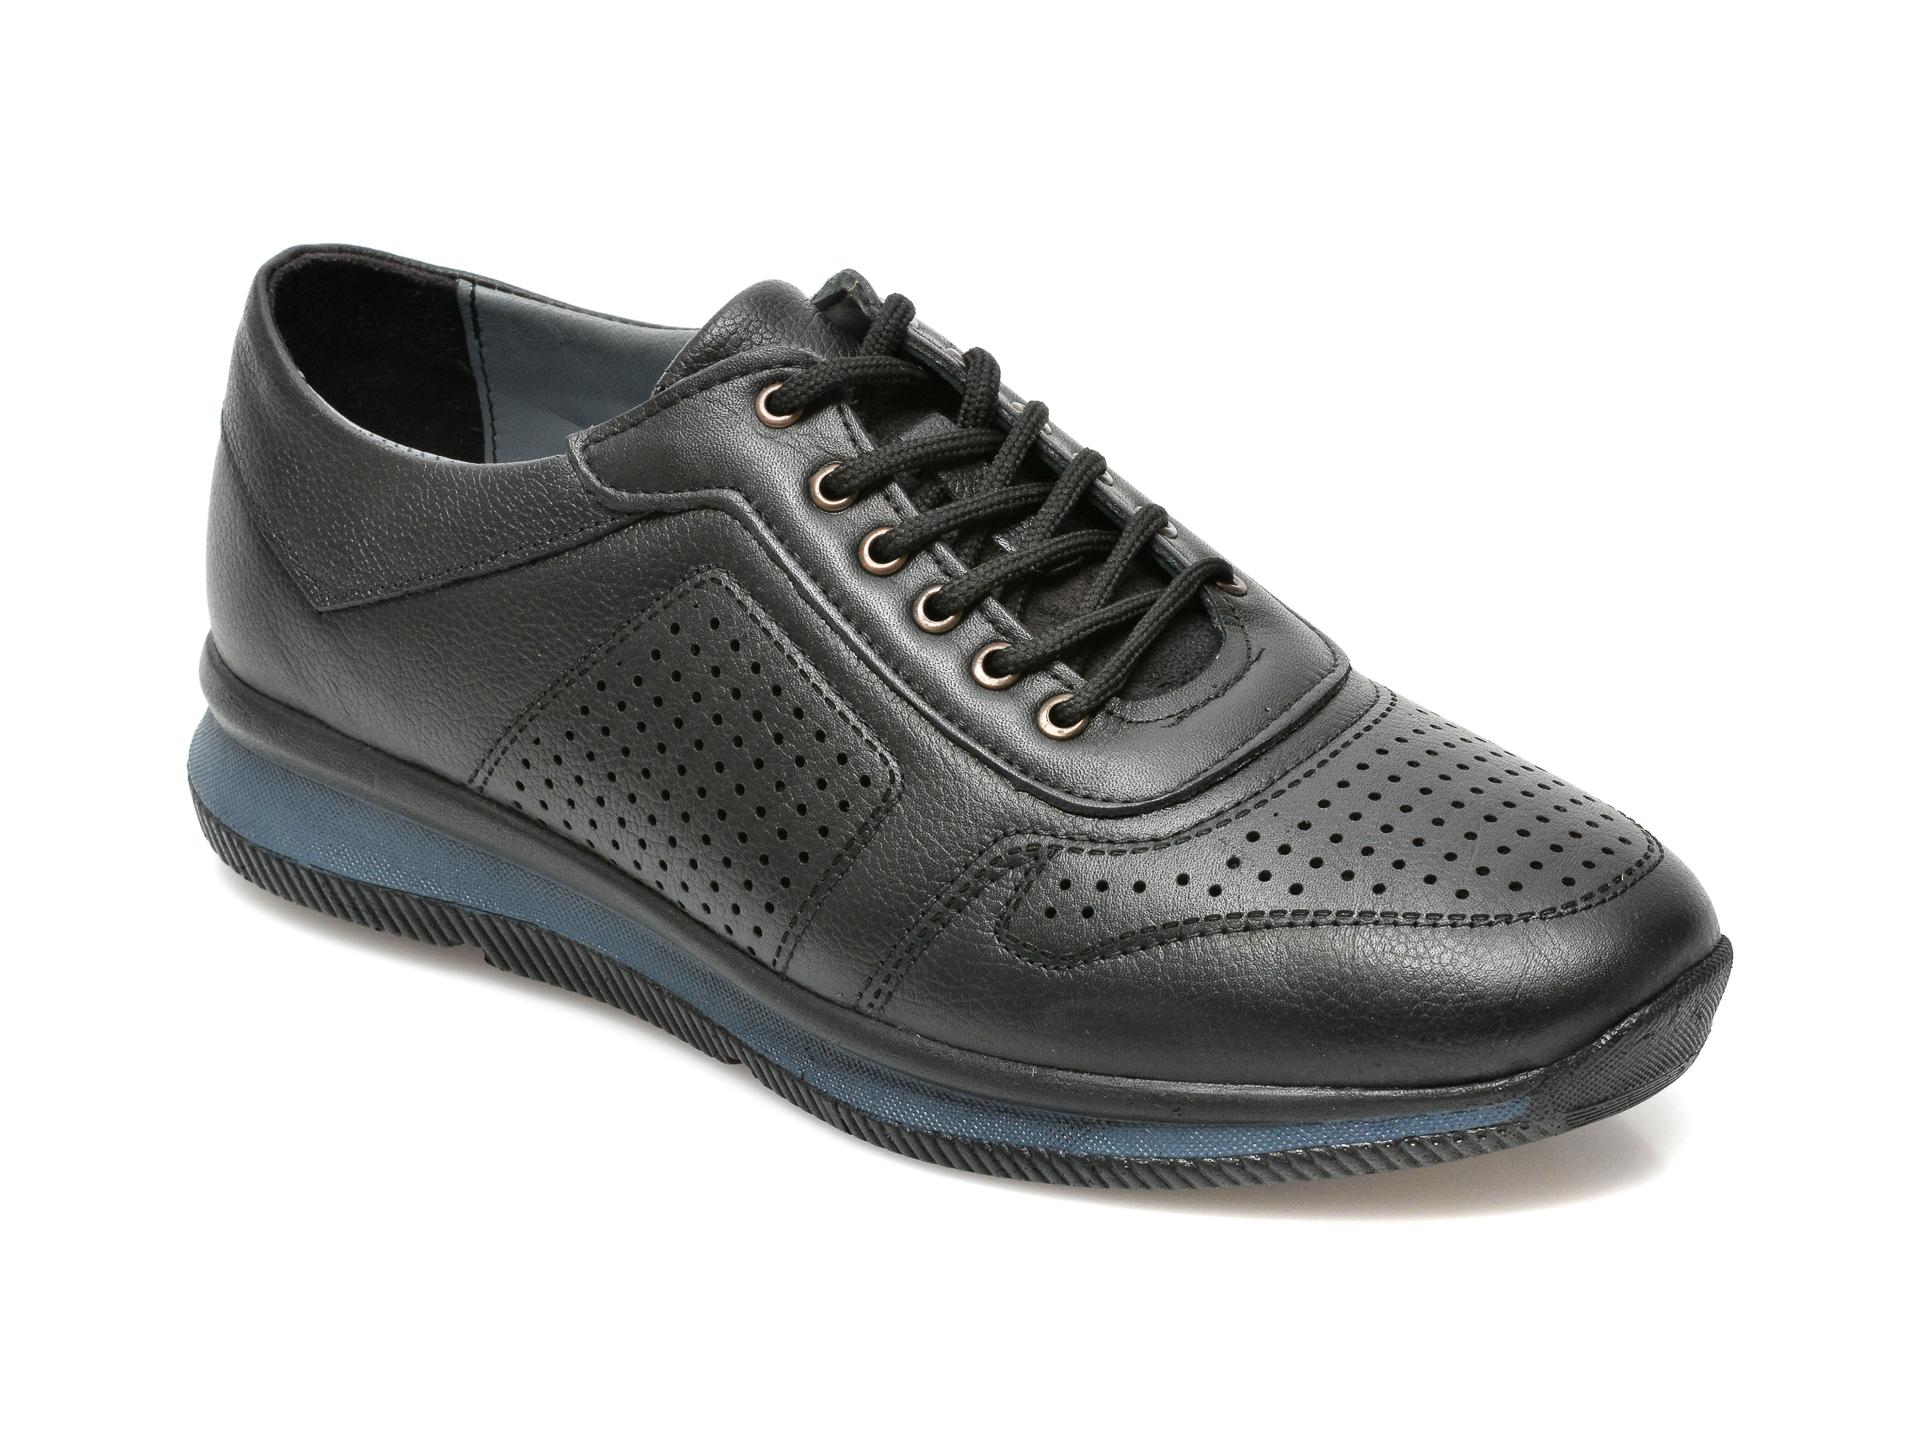 Pantofi OTTER negri, M1973, din piele naturala